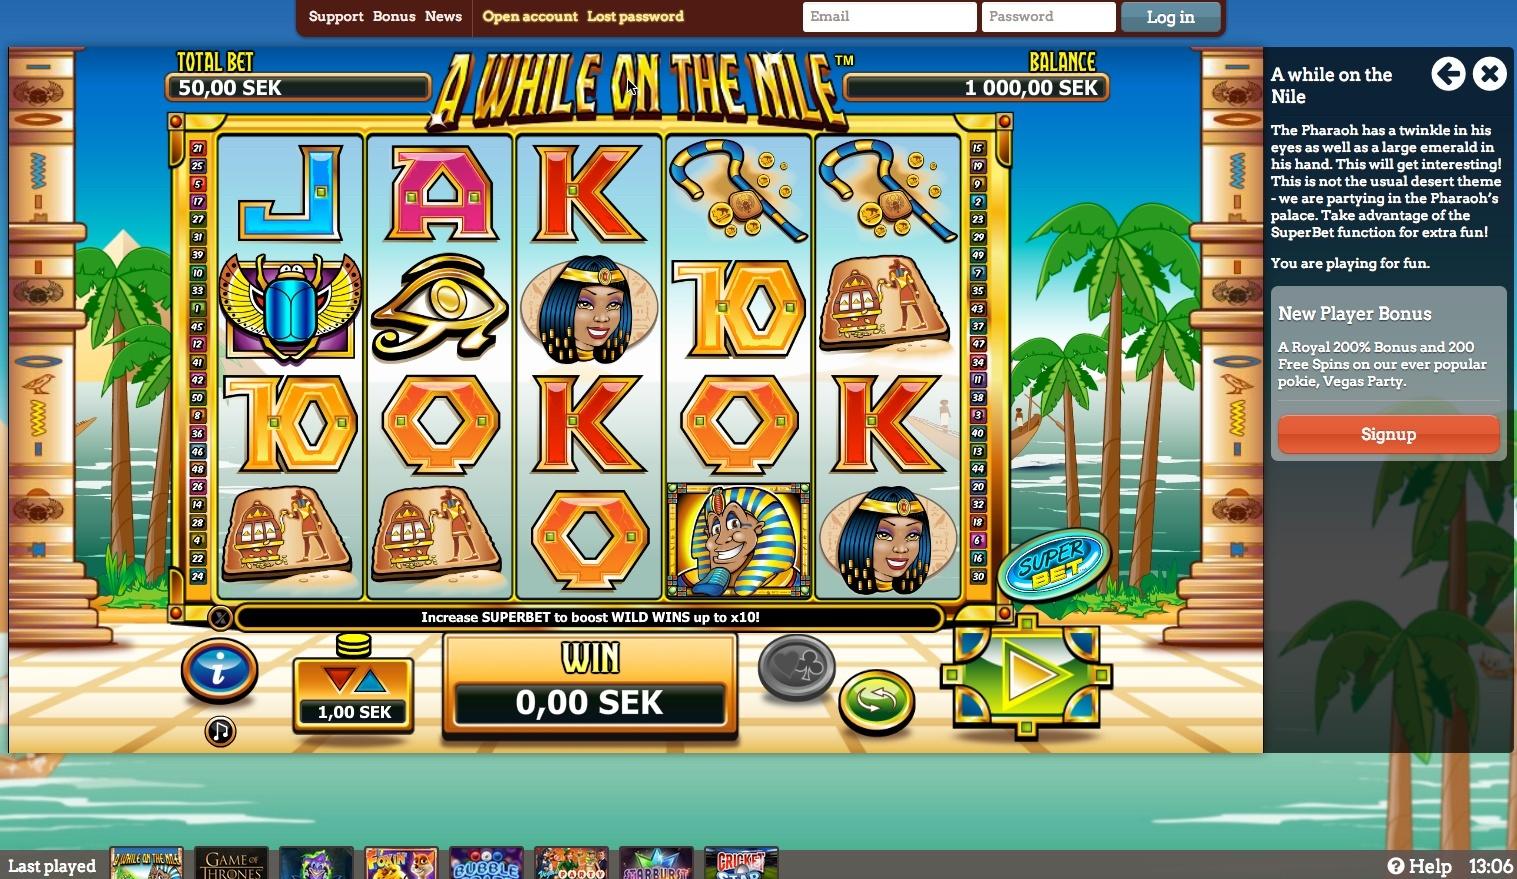 jackpot party casino online onlinecasino bonus